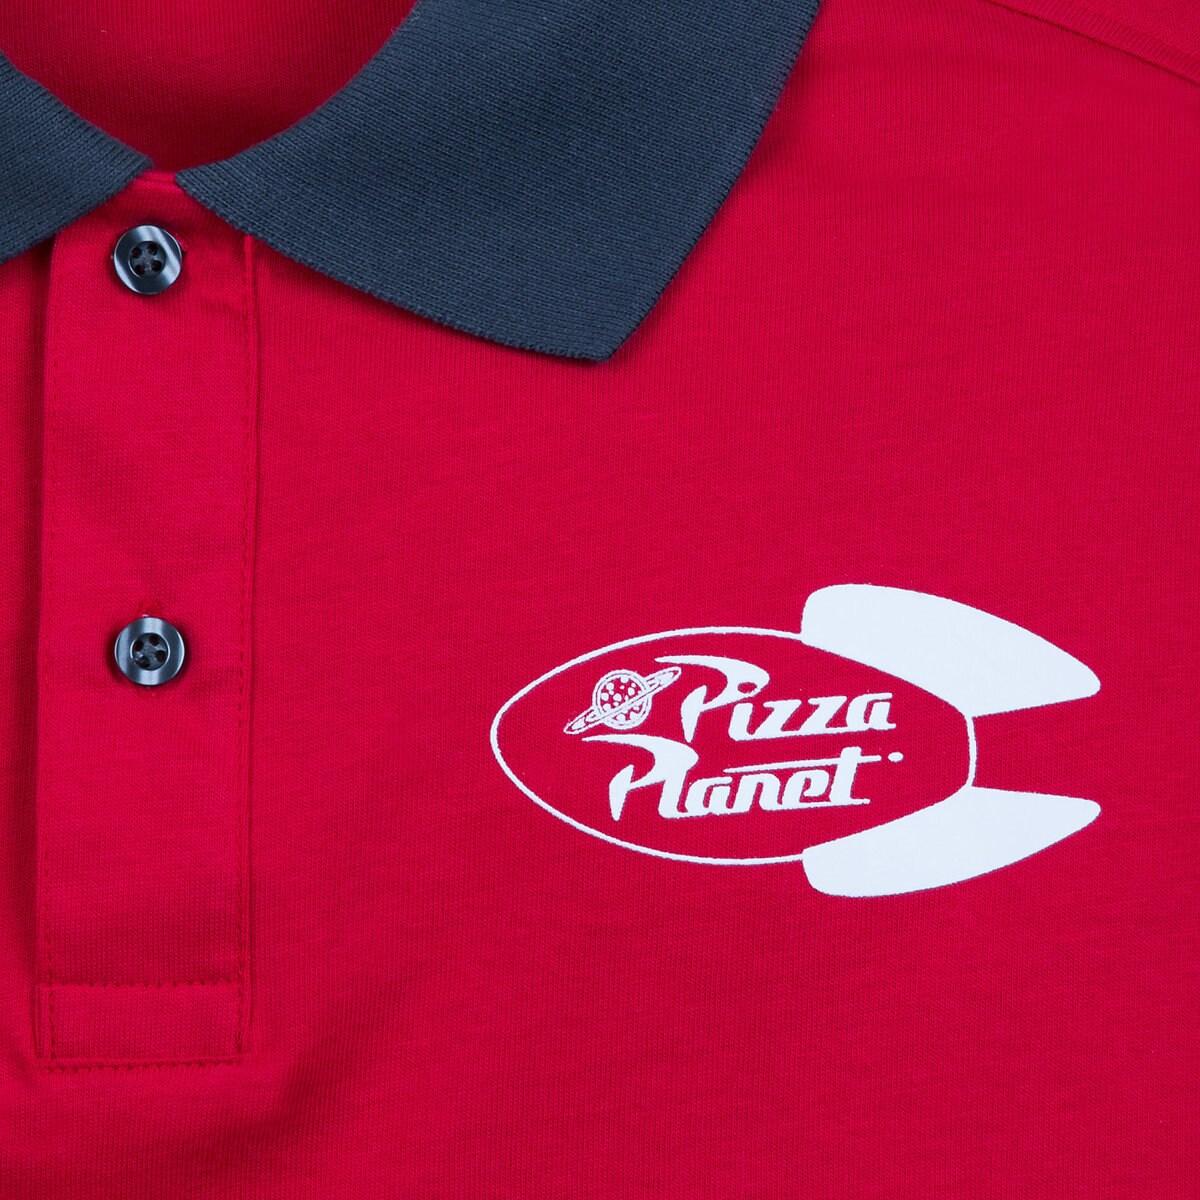 ebffda06d Pizza Planet Polo Shirt for Men - Toy Story